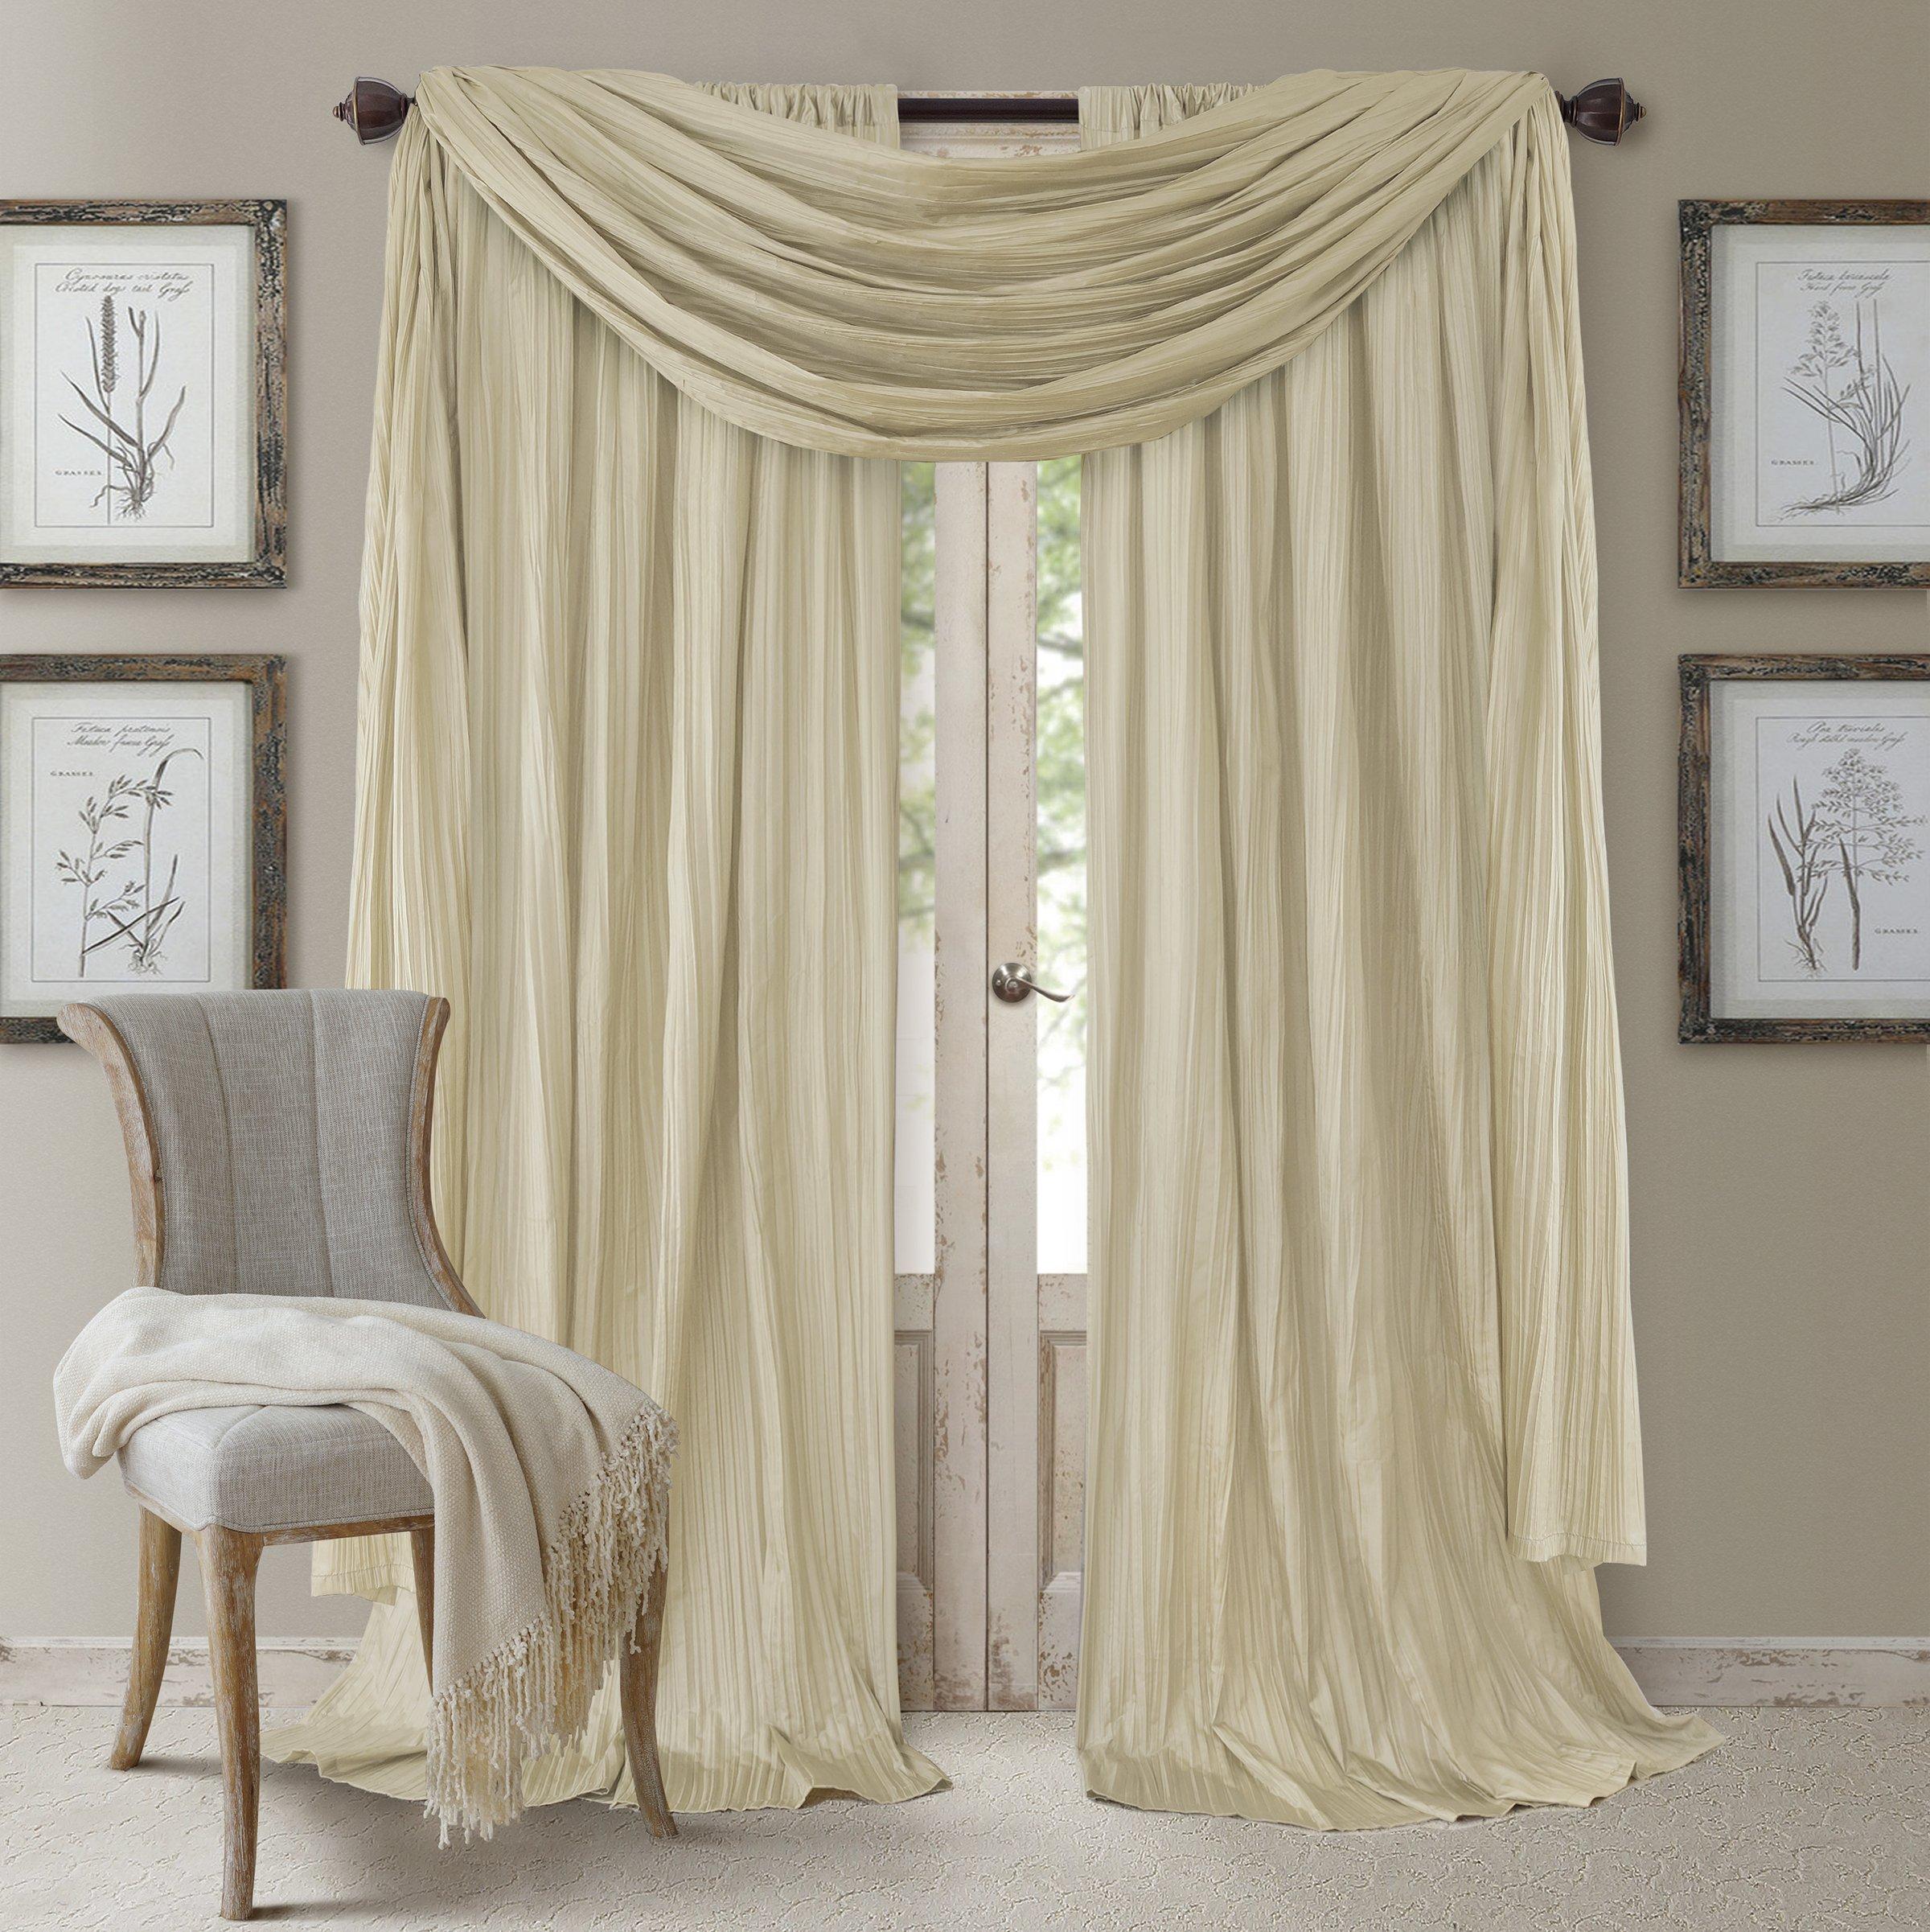 Elrene Home Fashions 26865857177 Window Curtain Drape Rod Pocket Panel, Set of 3, 52'' x 95'', Ivory, 52''x95'' Each (2 52''x216'' (1 Valance) by Elrene